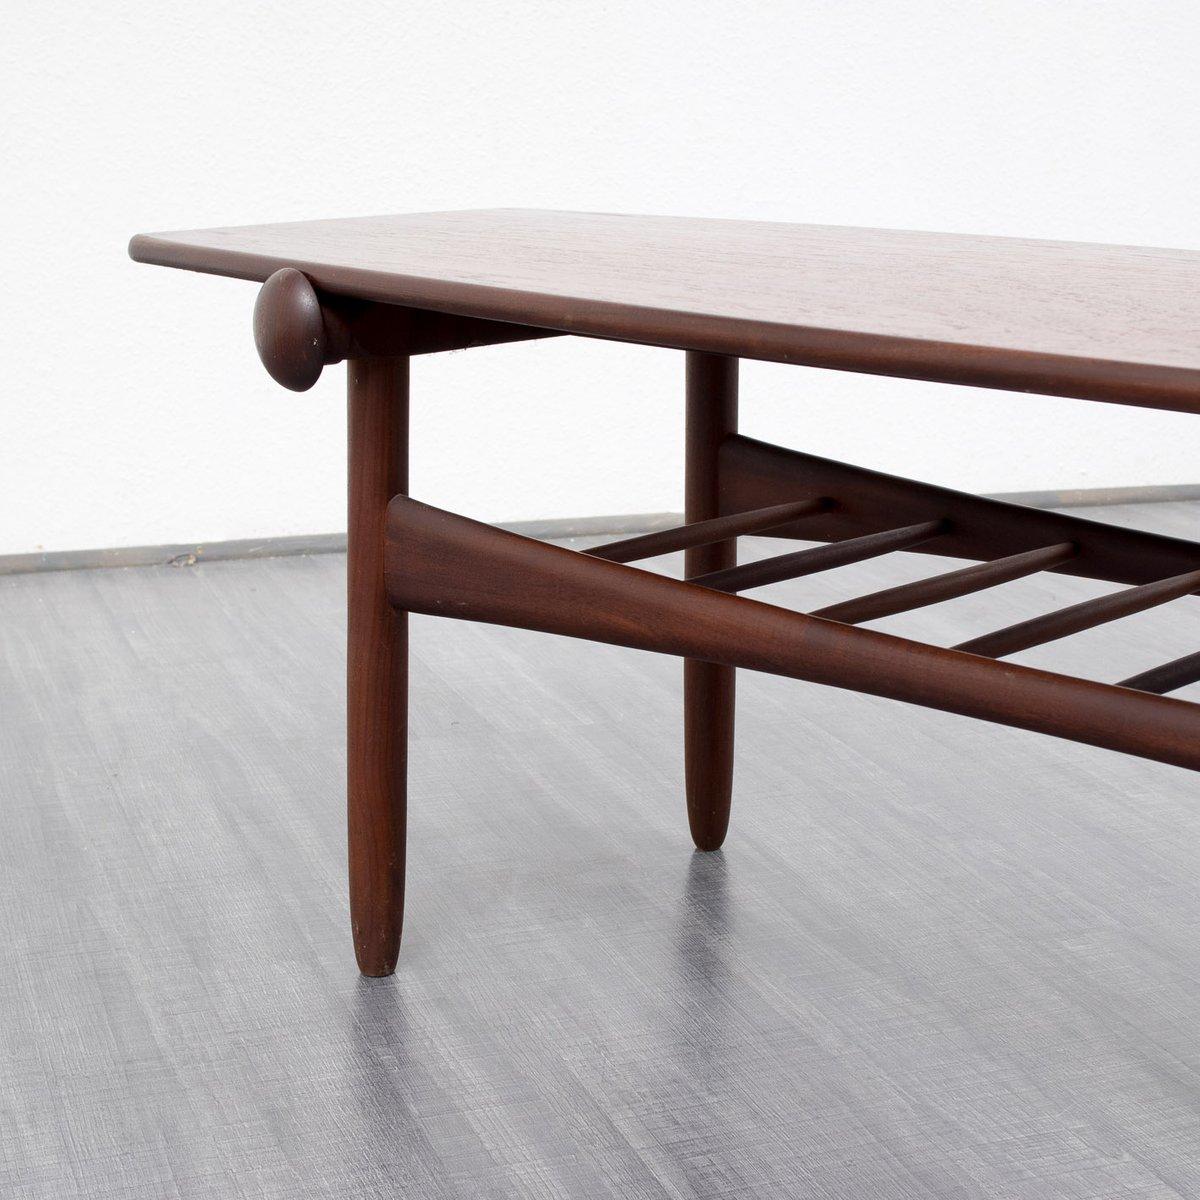 Teak Coloured Coffee Table: Scandinavian Style Teak Coffee Table, 1960s For Sale At Pamono